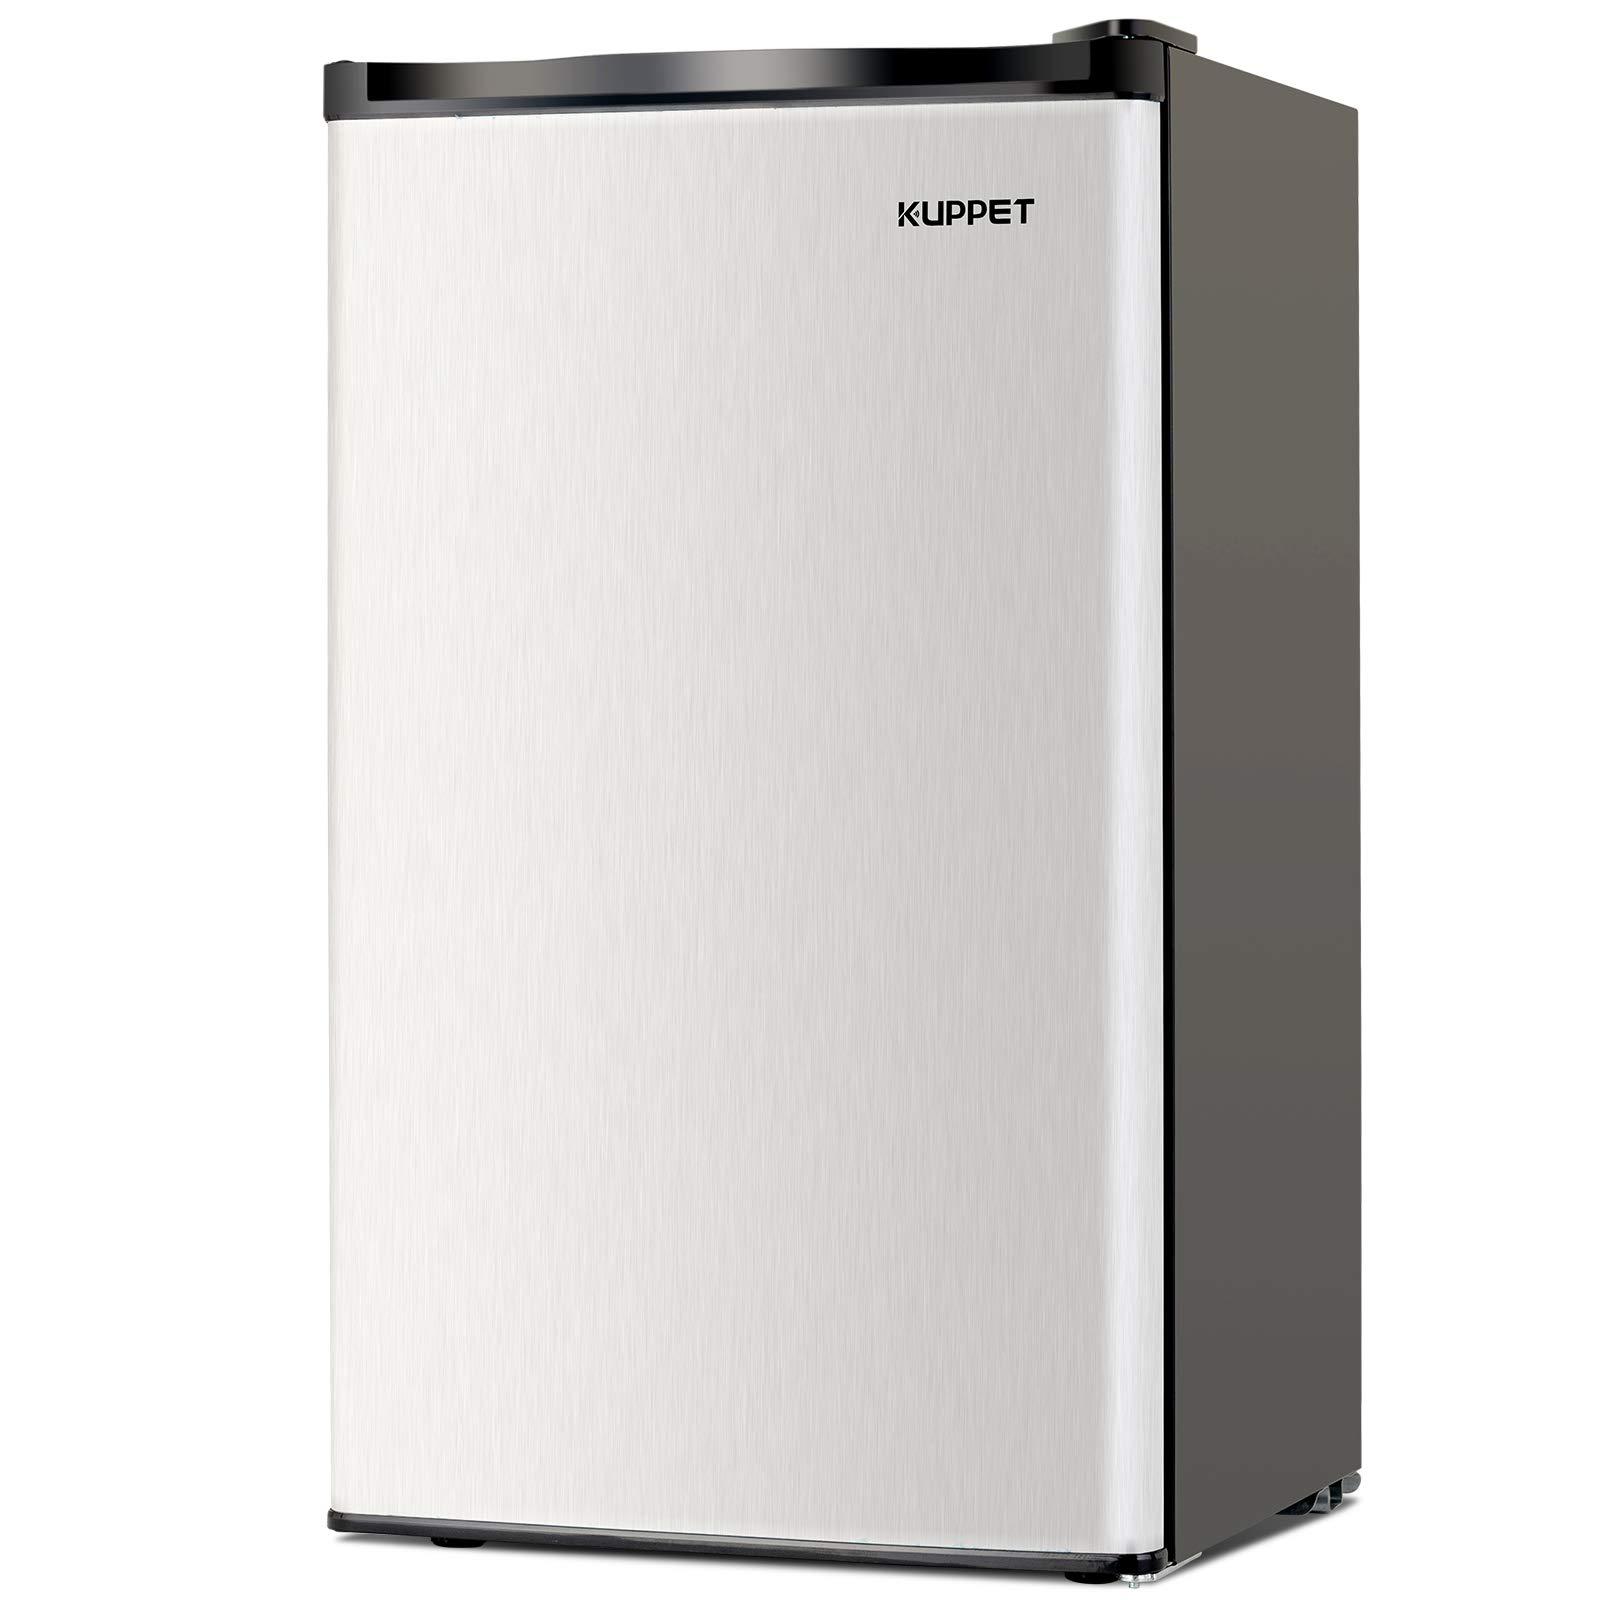 Kuppet-Mini Refrigerator Compact Refrigerator-Small Drink Food Storage Machine for Dorm, Garage, Camper, Basement or Office, Single Door Mini Fridge, 3.2 Cu.Ft,Stainless Steel